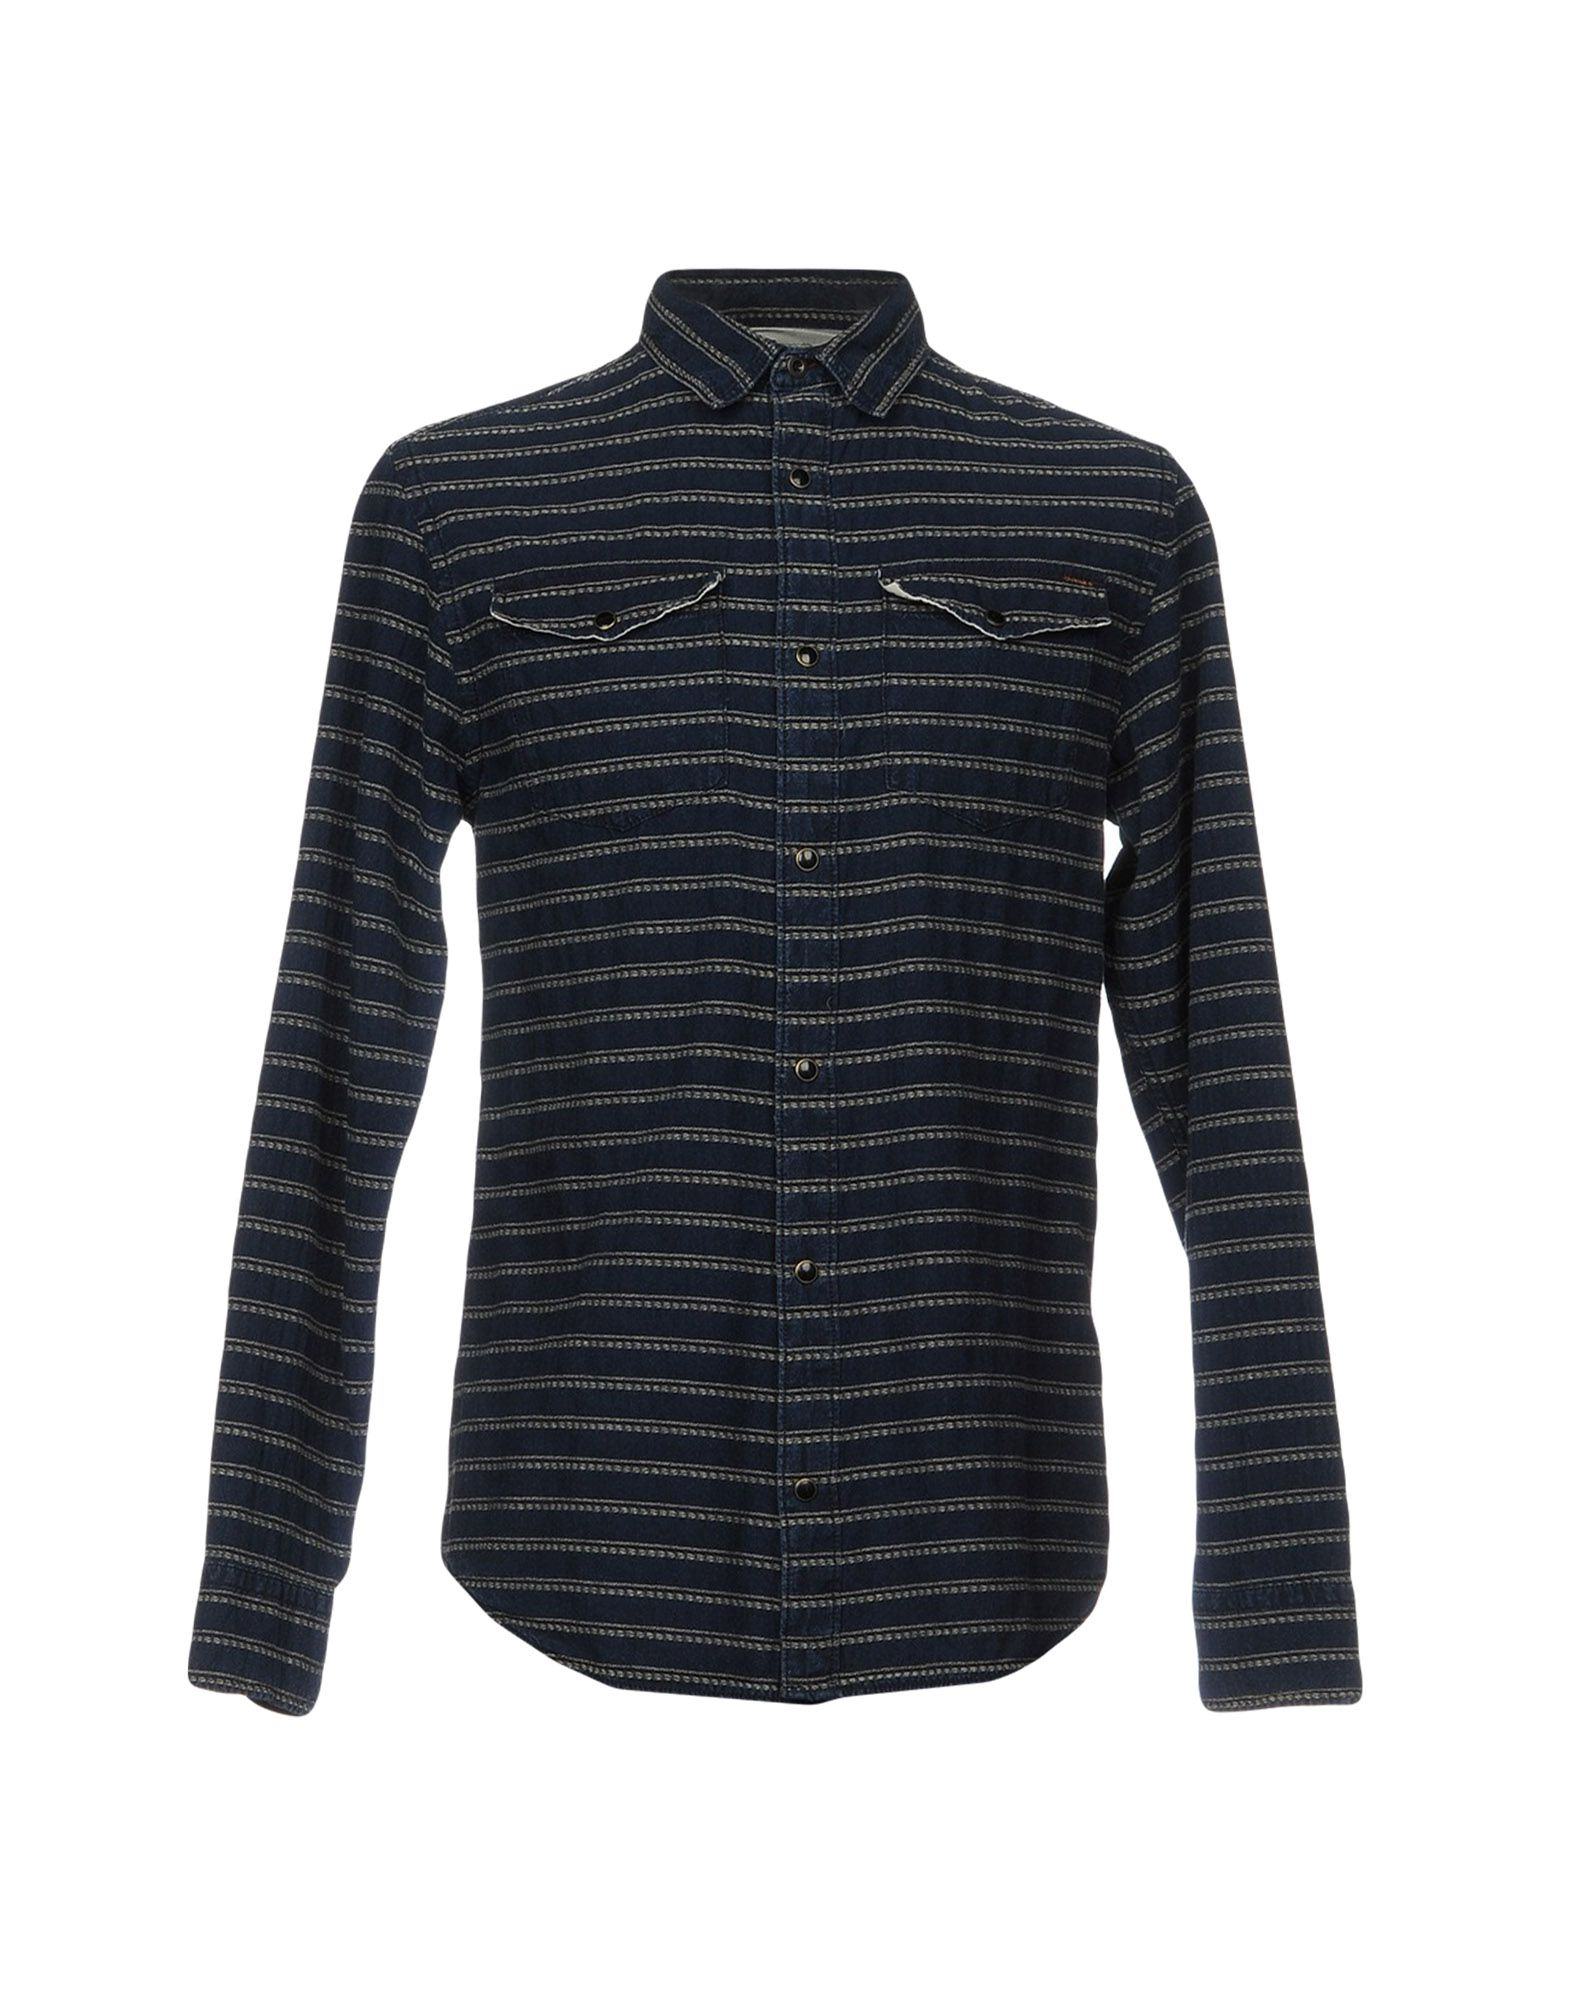 JACK & JONES VINTAGE Джинсовая рубашка рубашка джинсовая jack